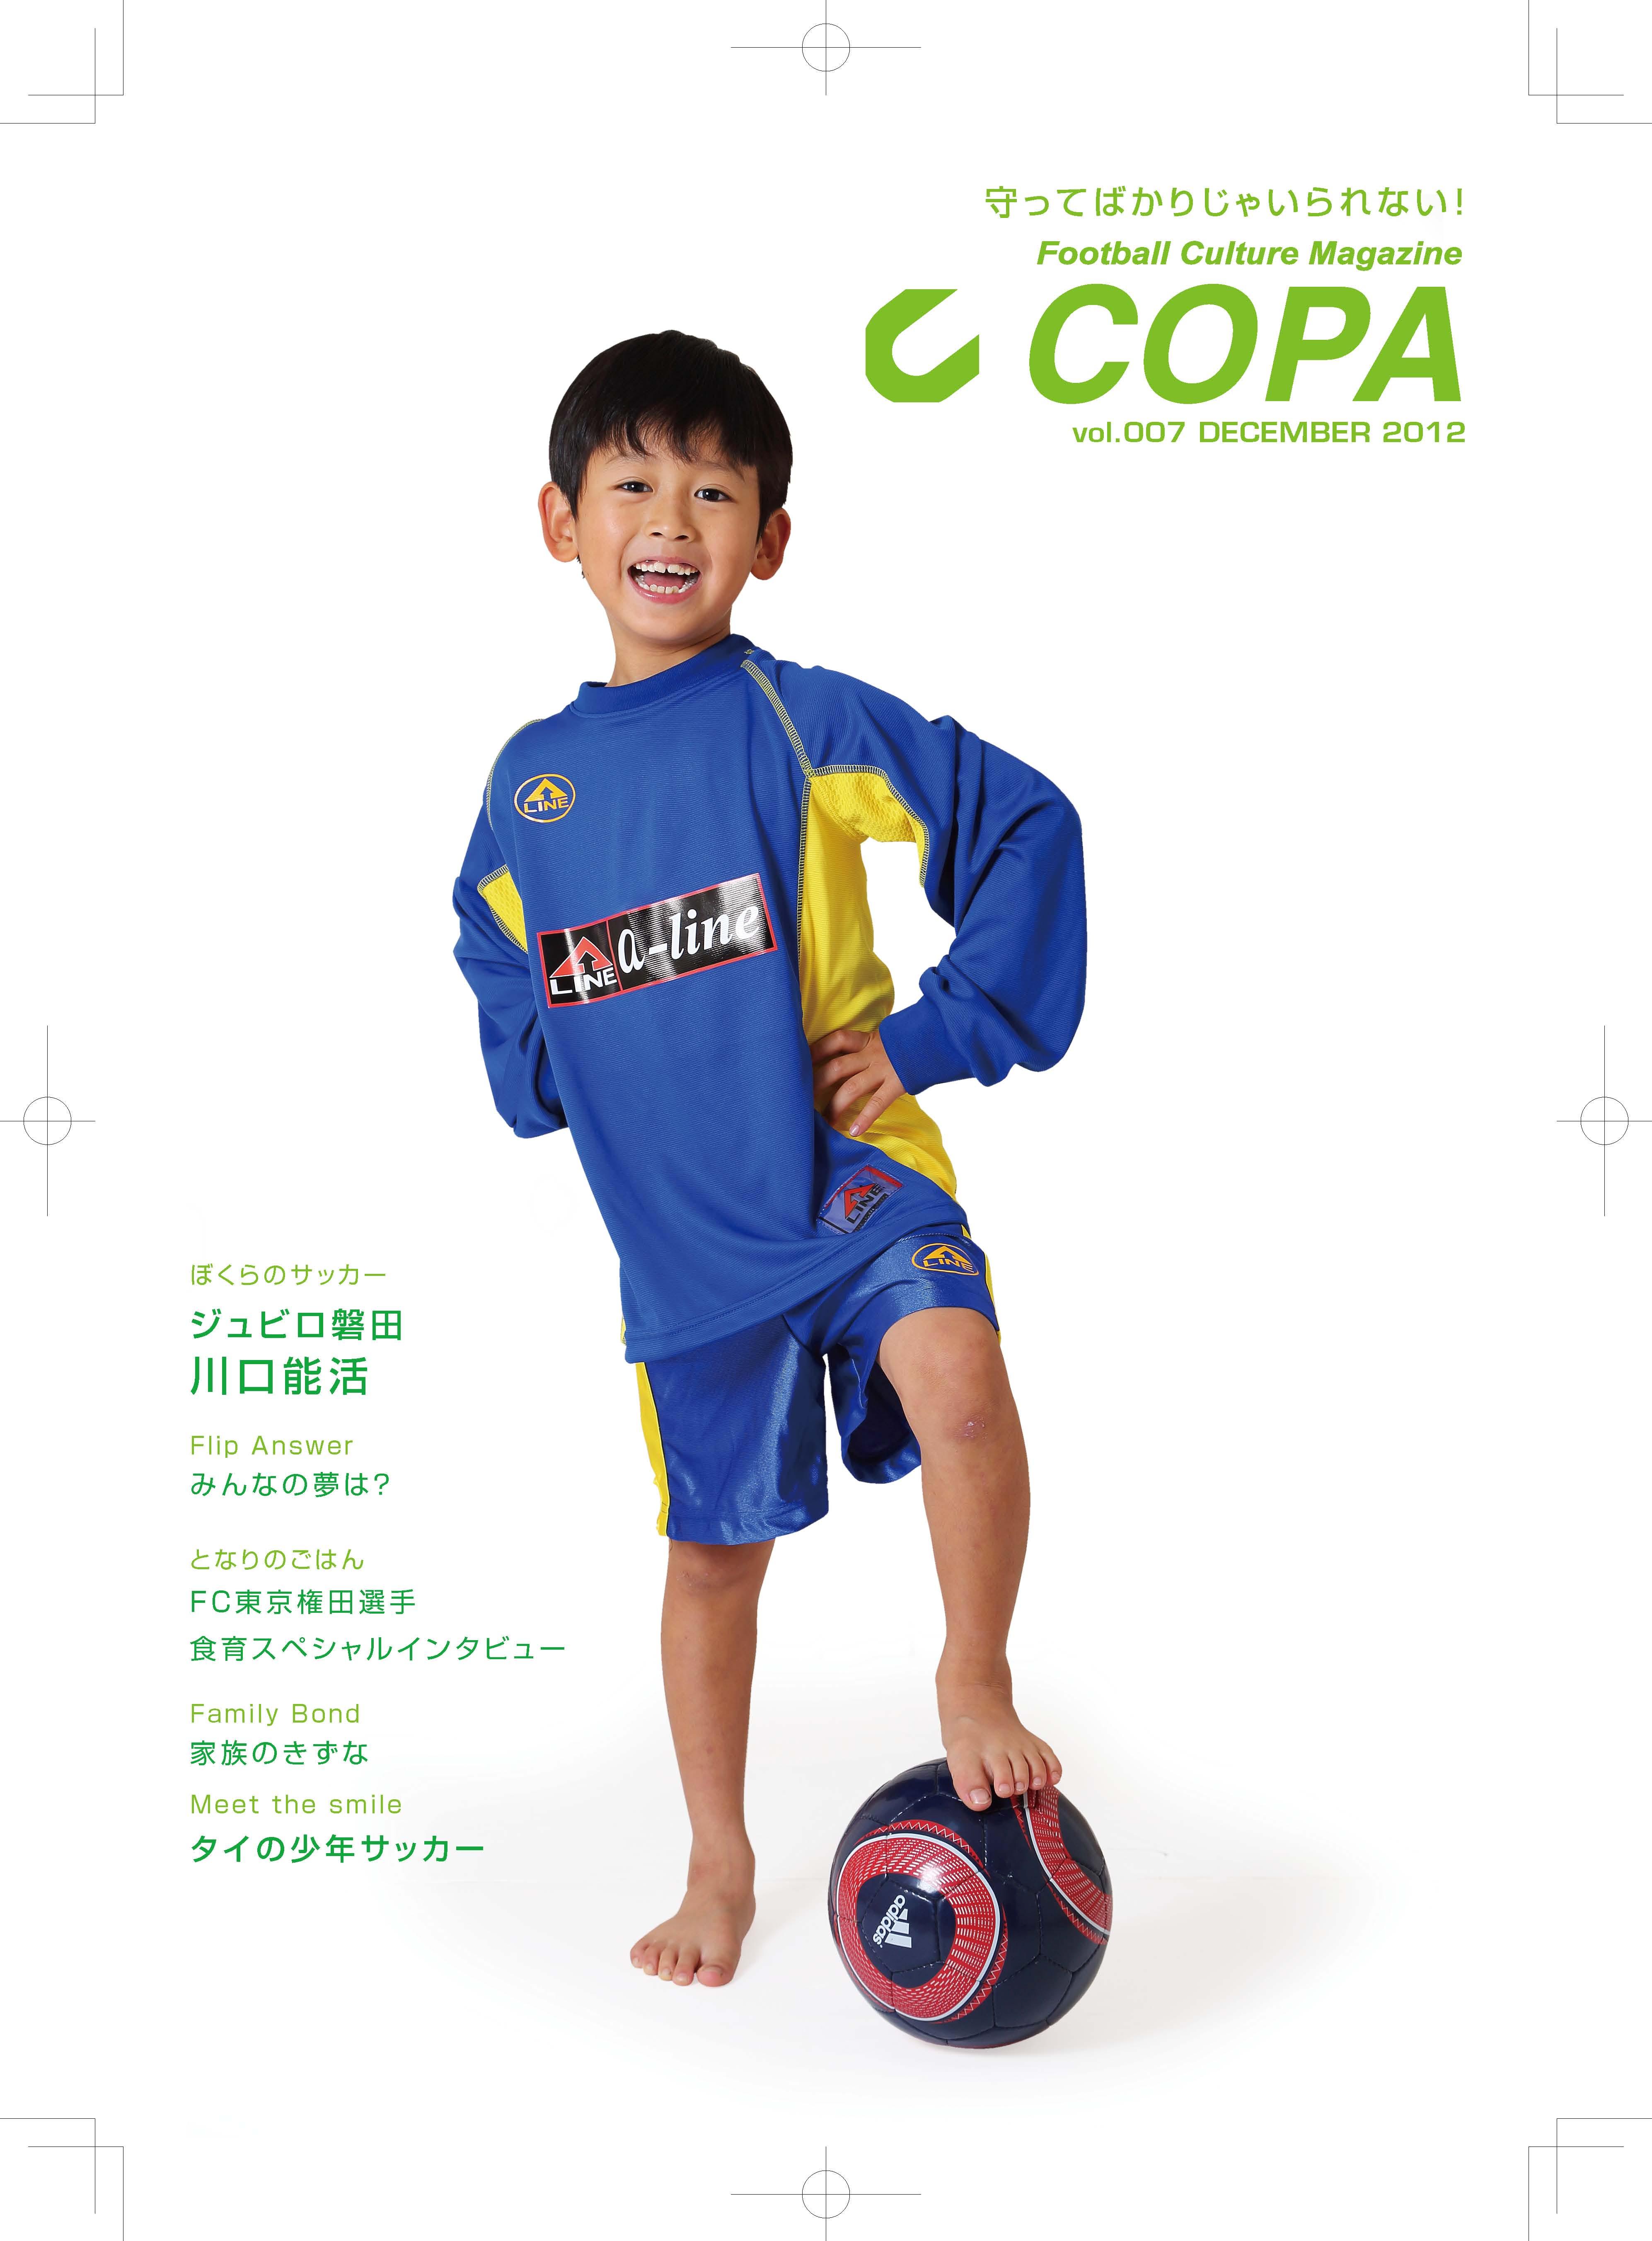 copa007 hp cover